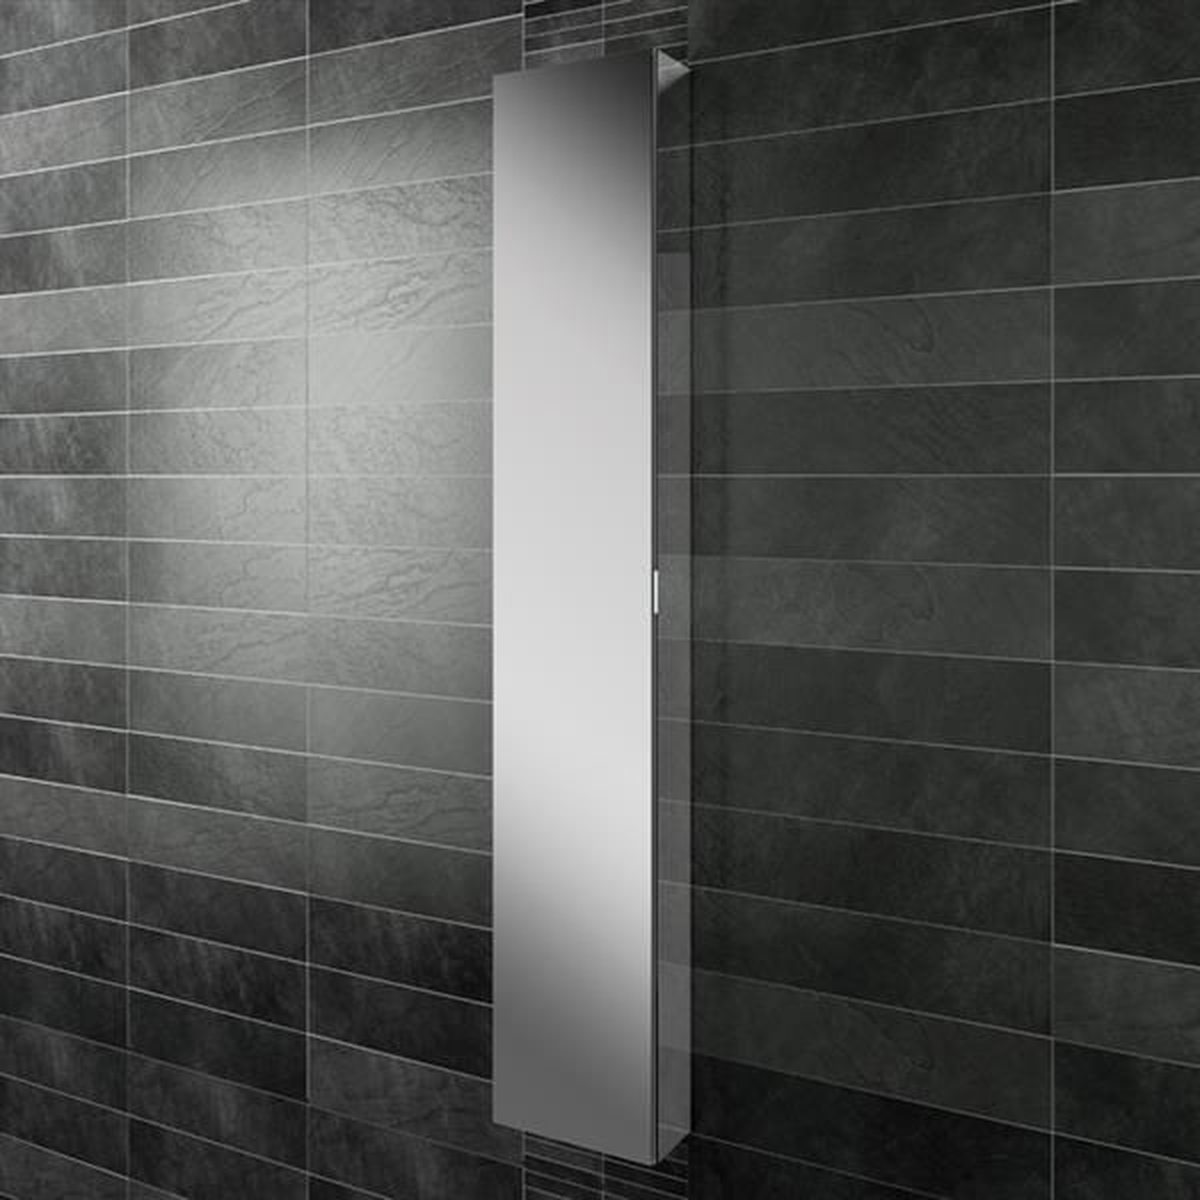 HiB Eris 30 Single Door Mirrored Tall Cabinet